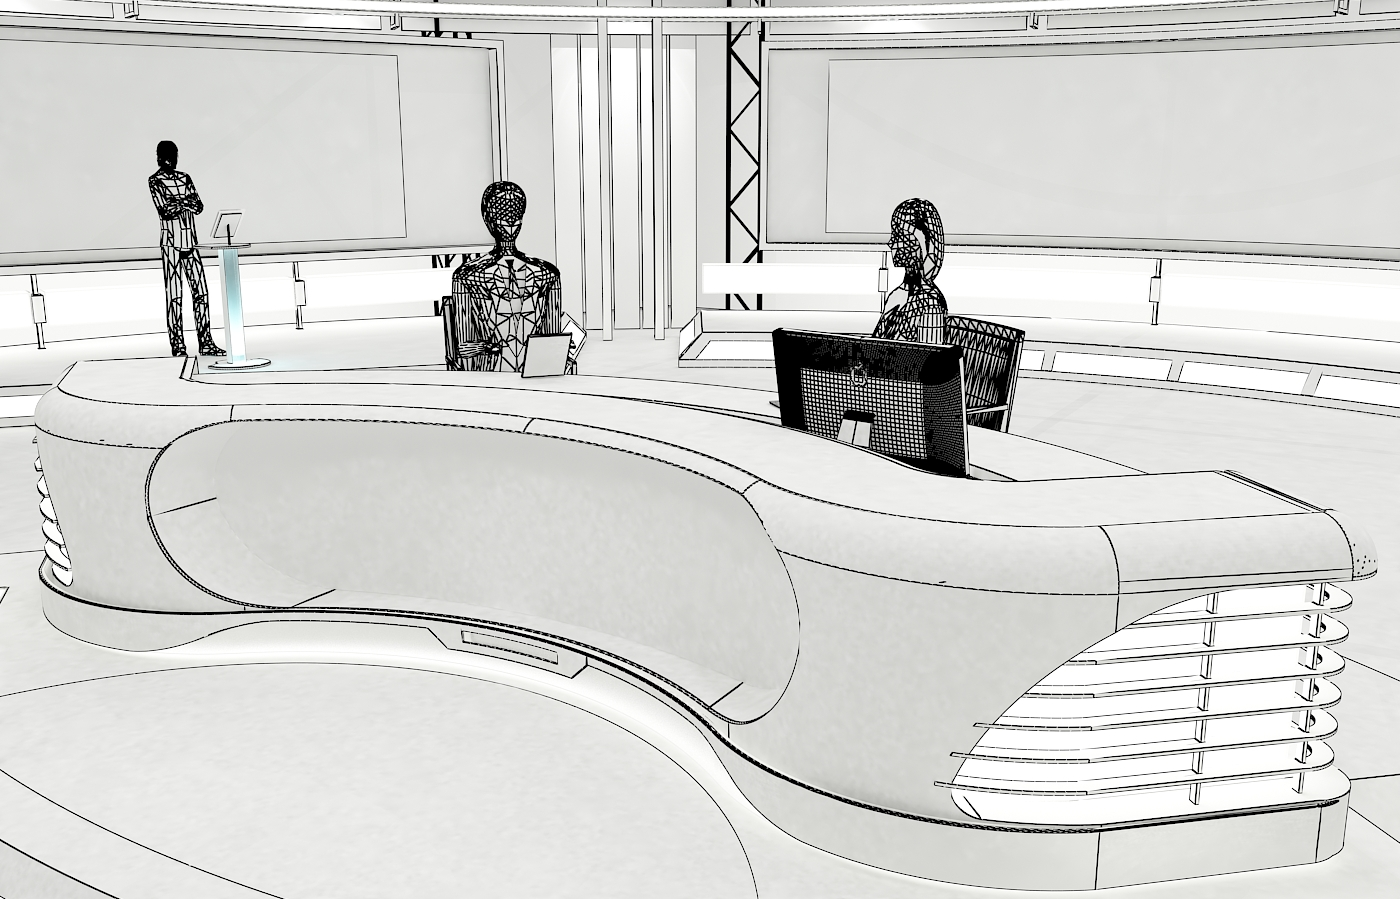 виртуал телевизийн студи цуглуулга vol 6 3d загвар max dxf dwg fbx obj 223380